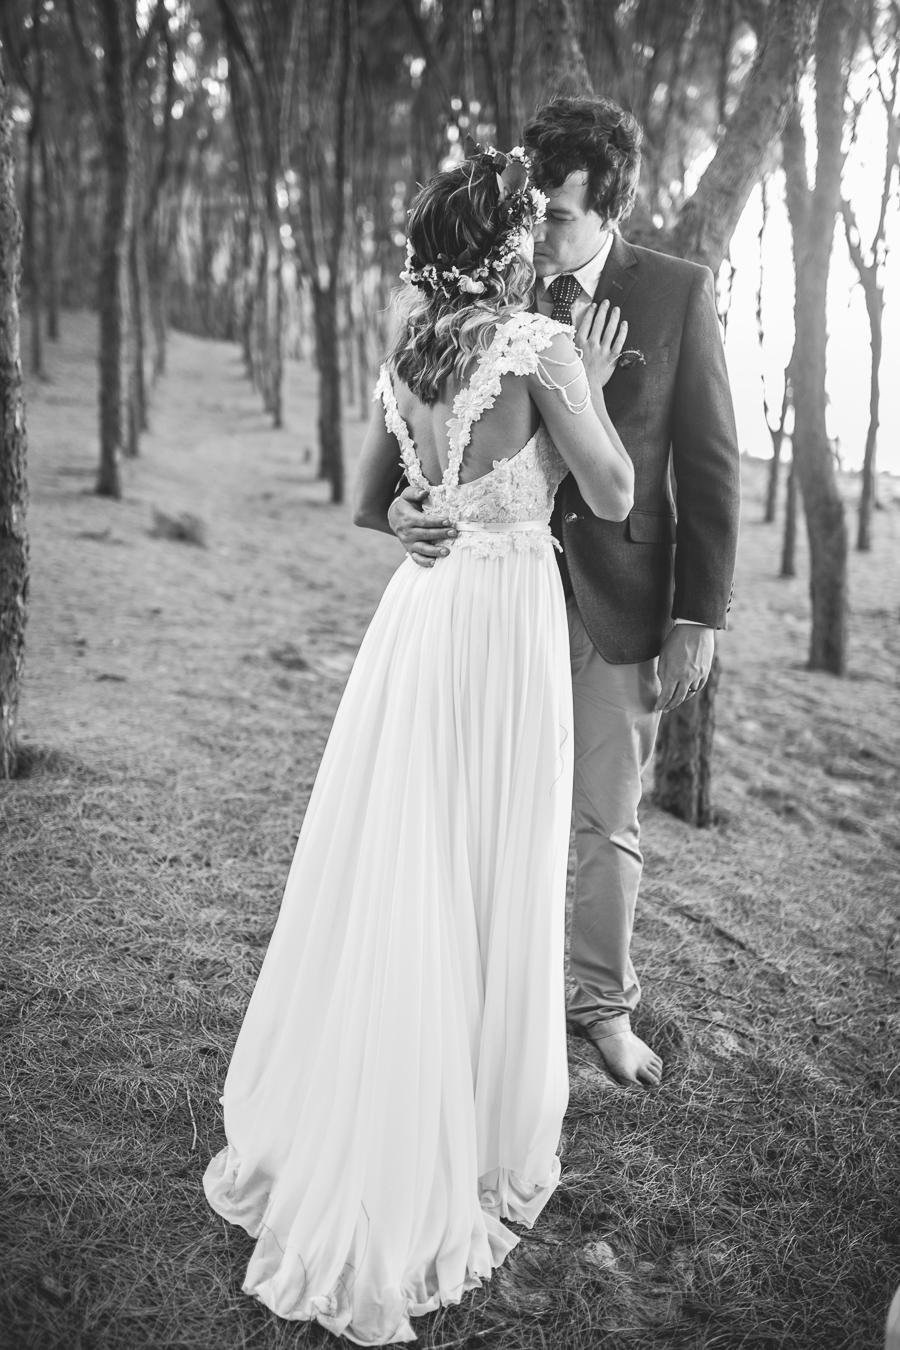 Nadia&Johan_Beachwedding_TanyaStraussphotography-140